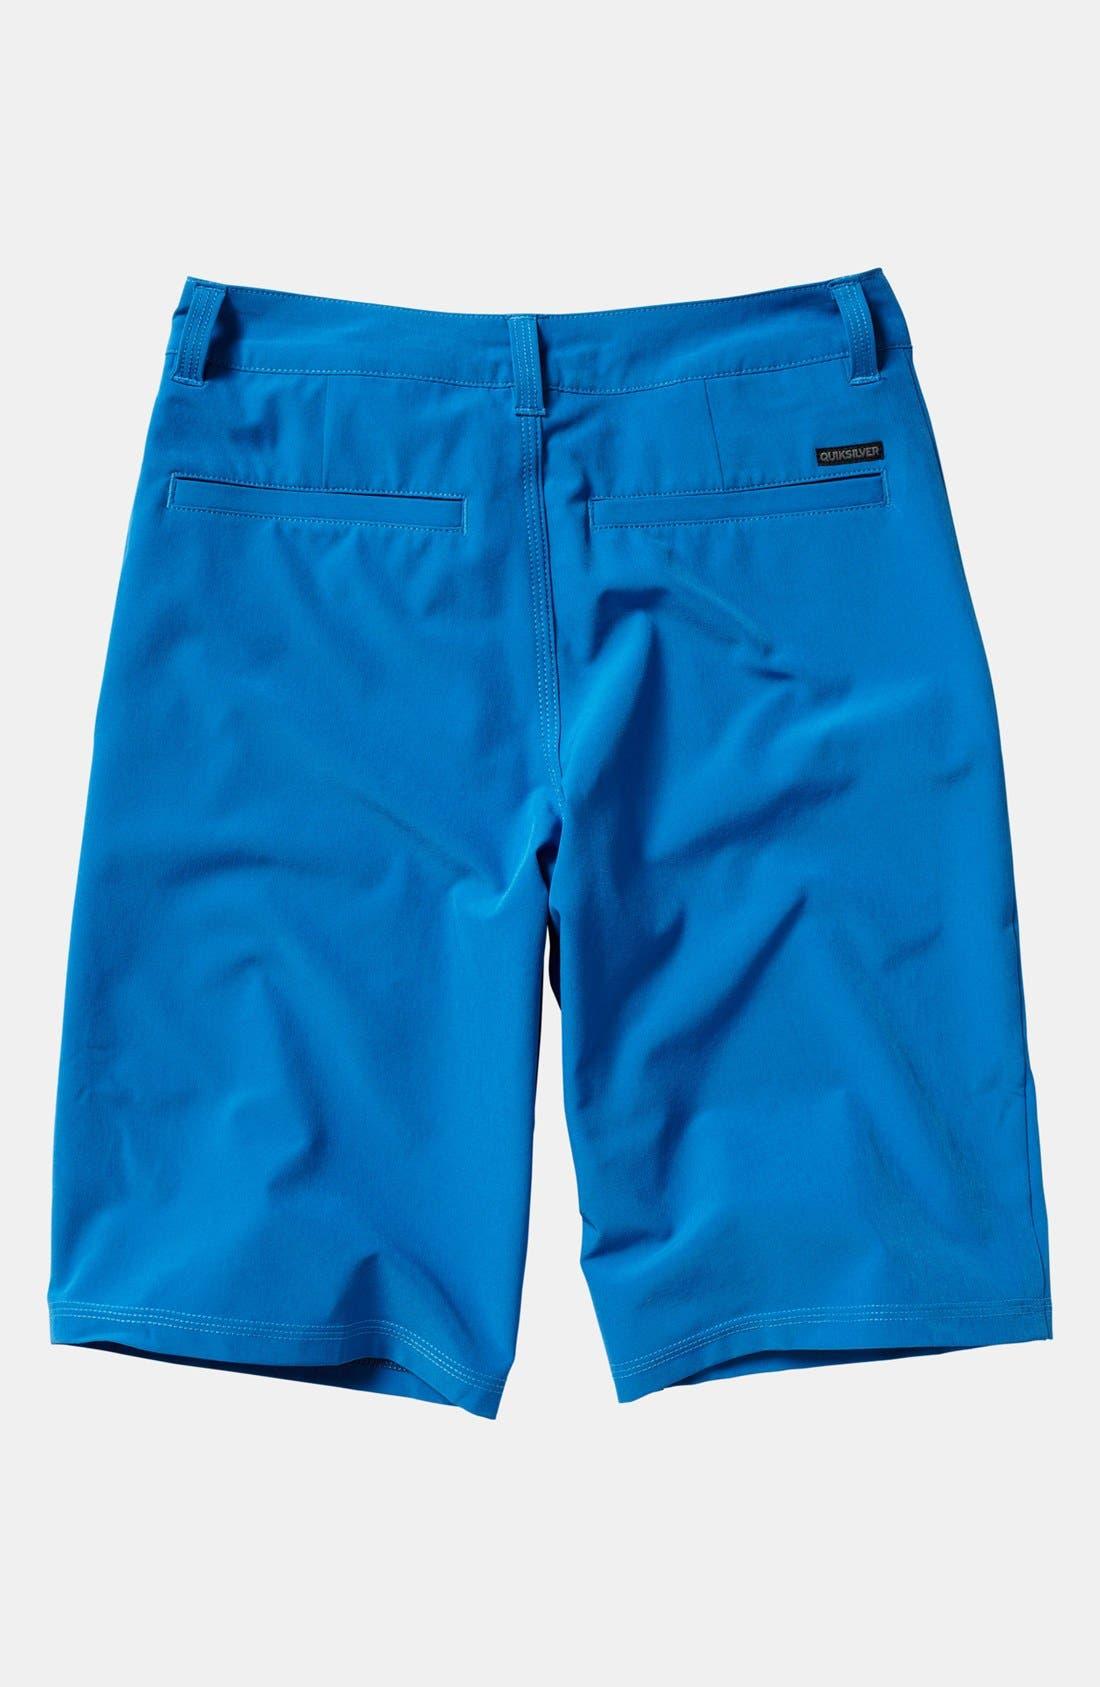 Alternate Image 2  - Quiksilver 'F.A.A.' Water Repellent Shorts (Big Boys)